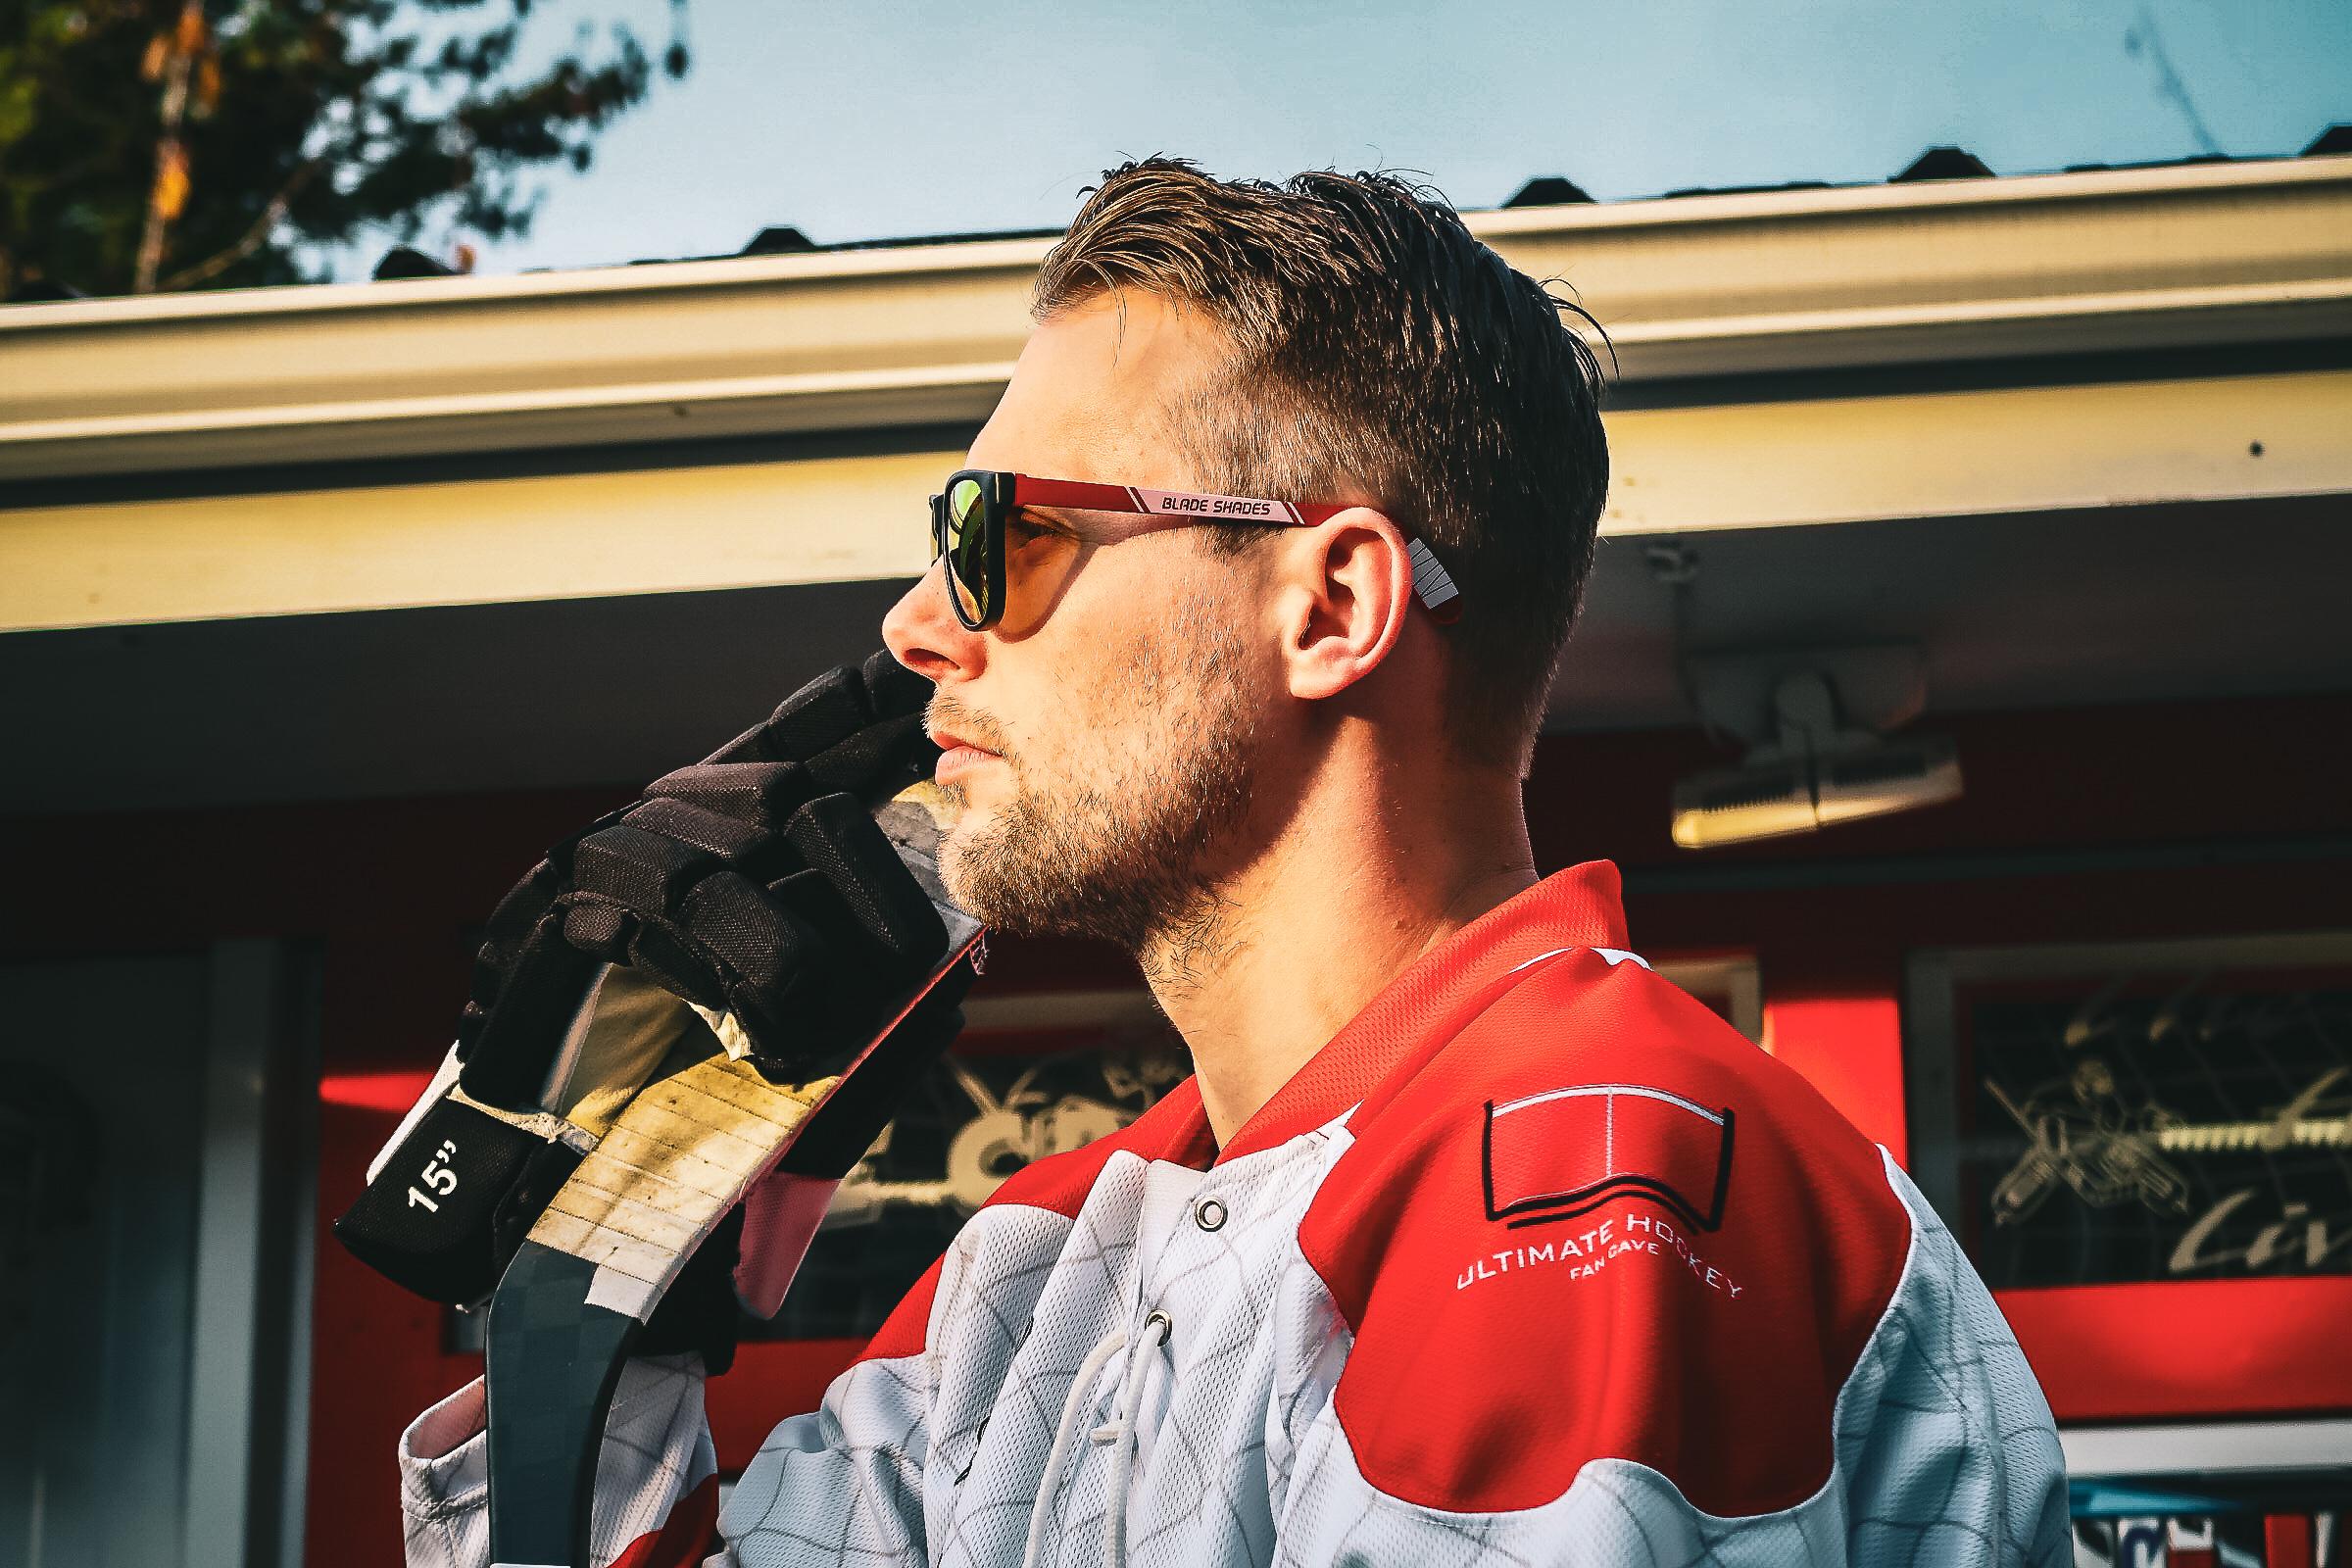 Blade Shades - Hockey Sunglasses for Hockey People